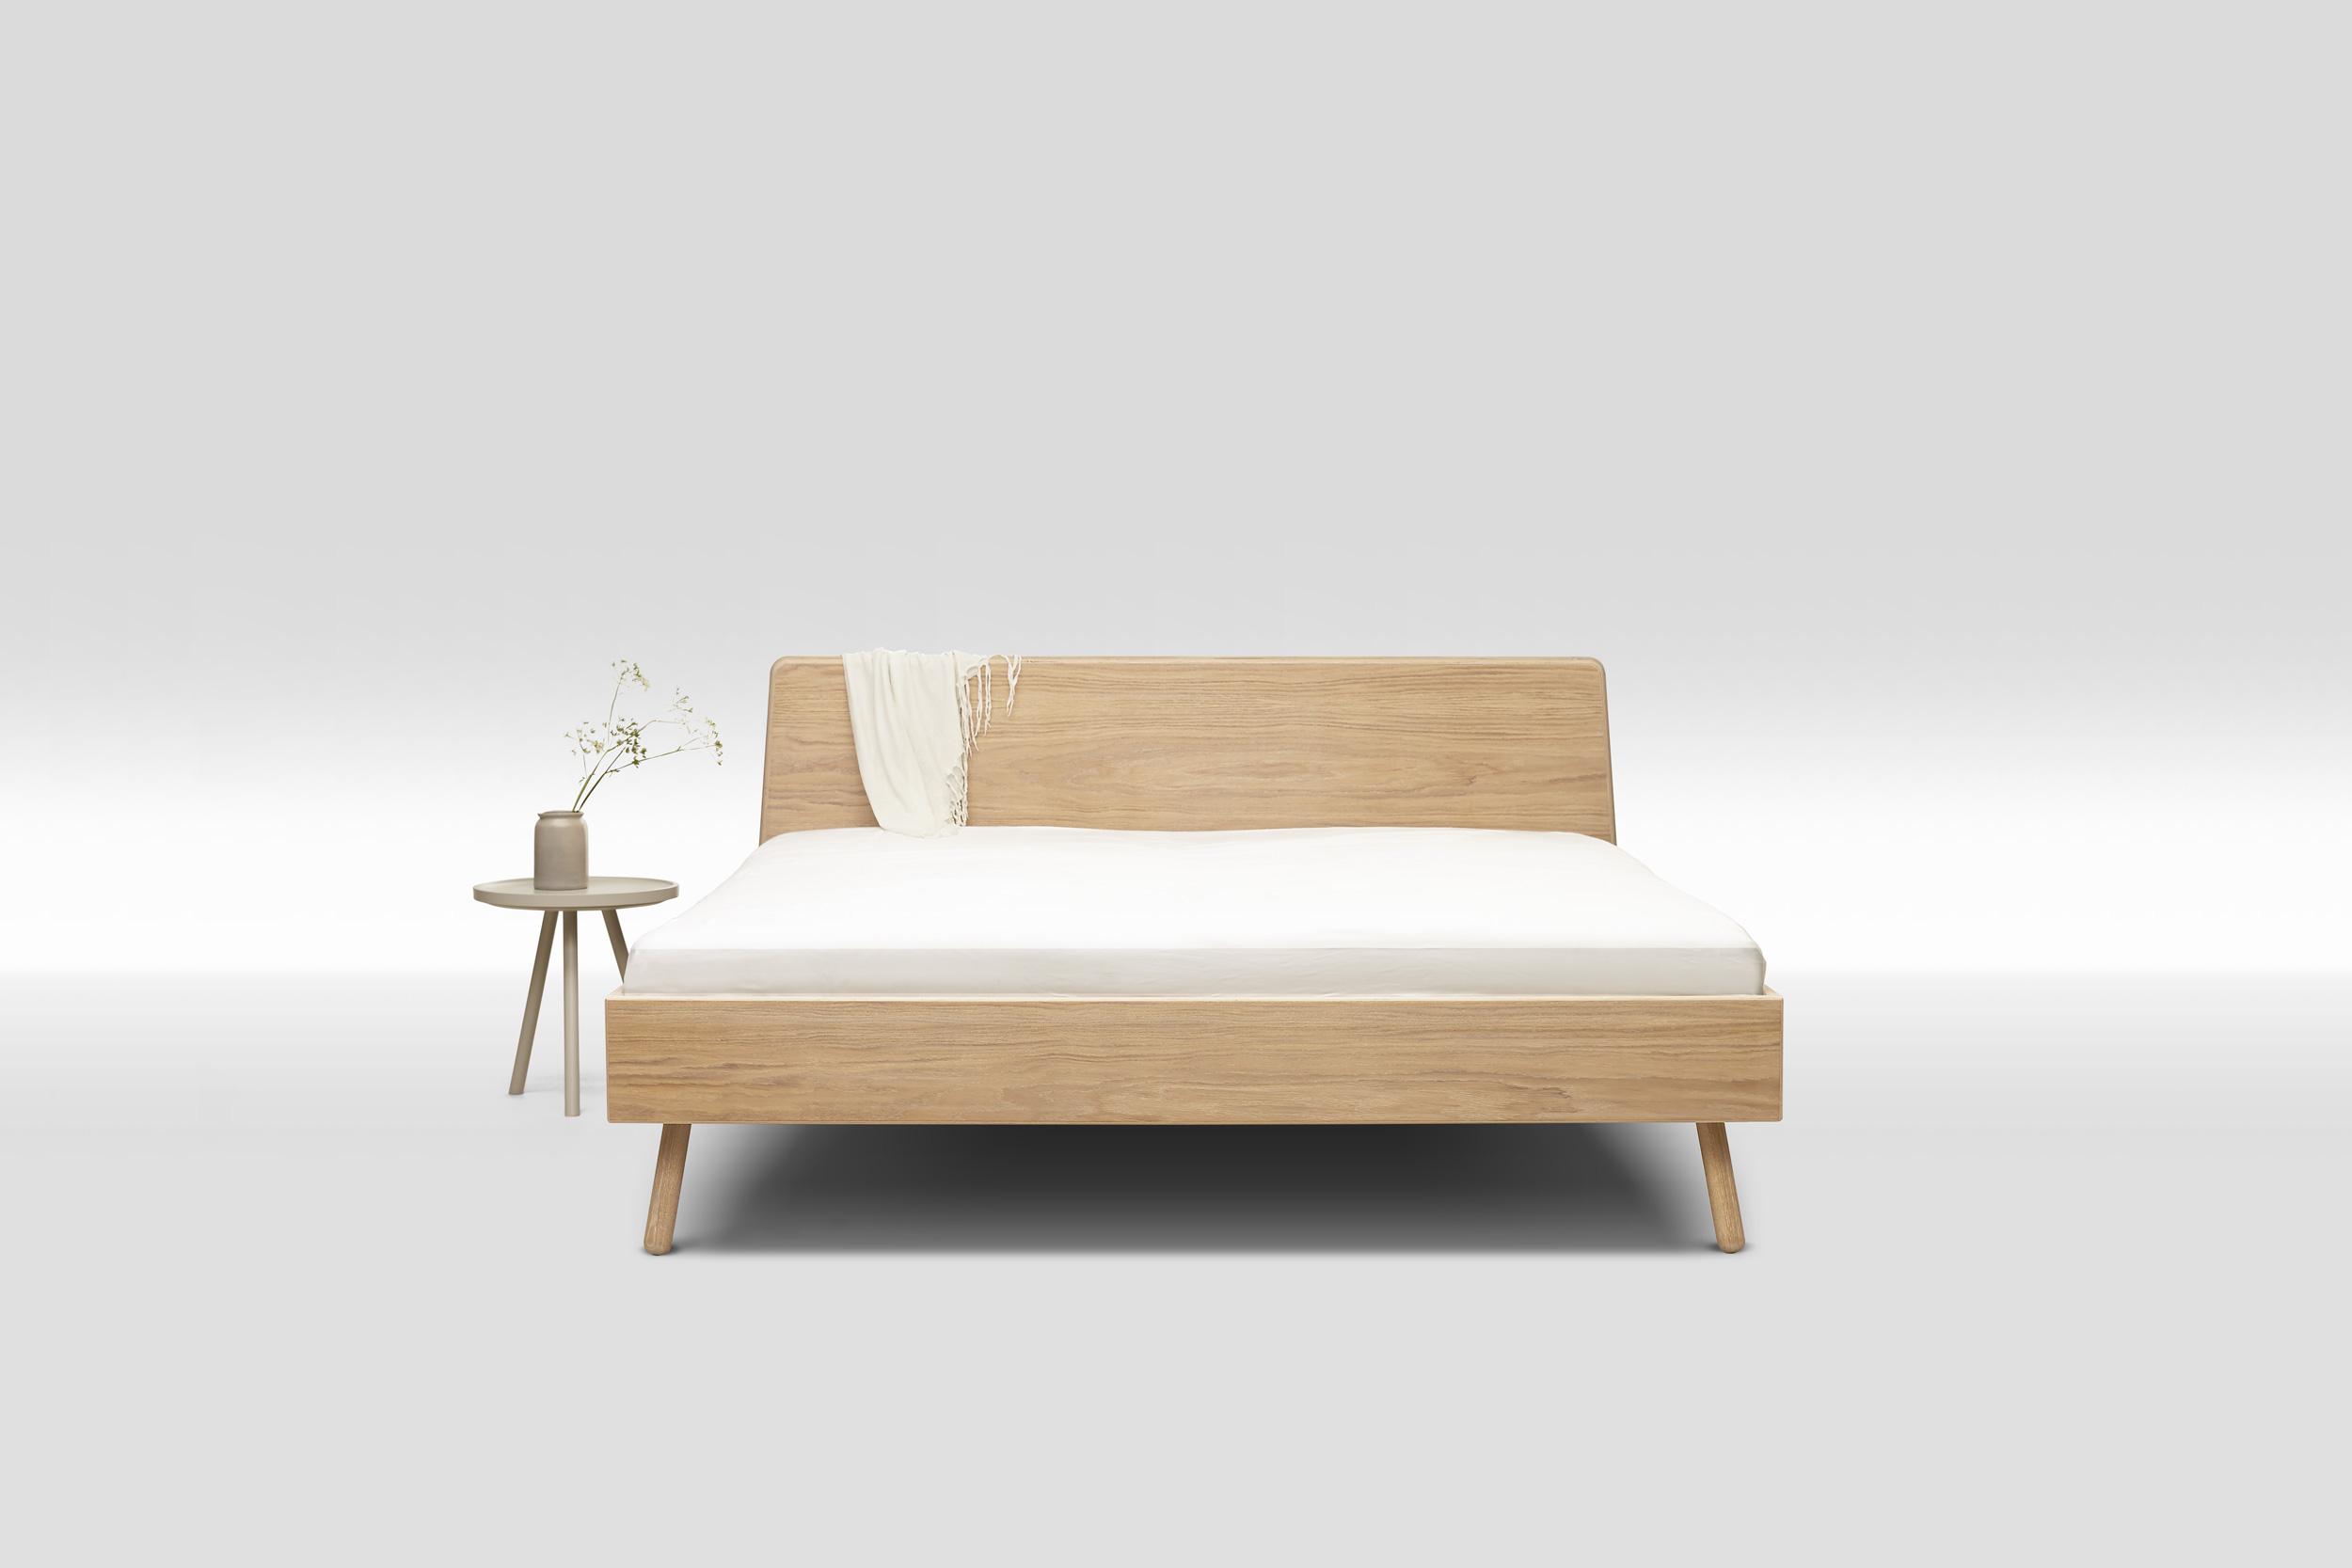 nat rliches bett aus gesundem holz interiorpark. Black Bedroom Furniture Sets. Home Design Ideas